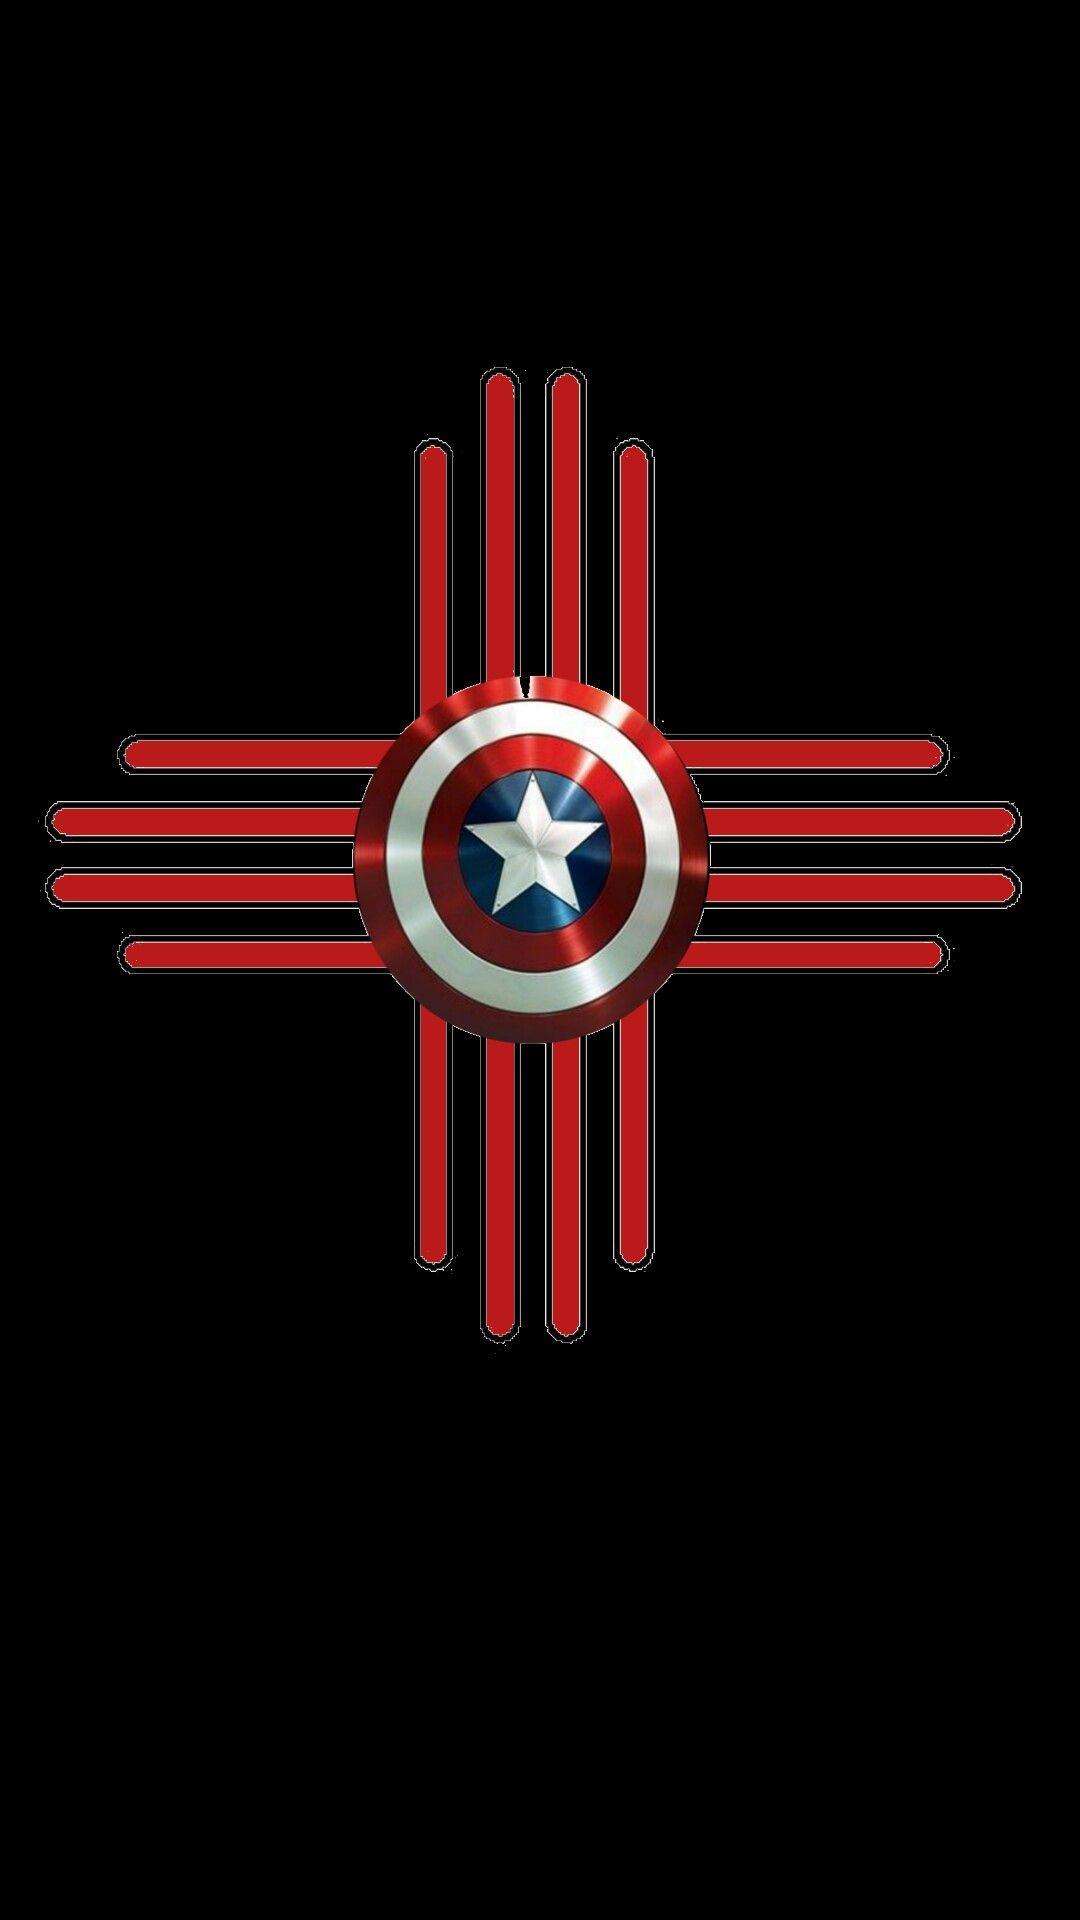 Zia Capt America in 2019 Albuquerque news, New mexico